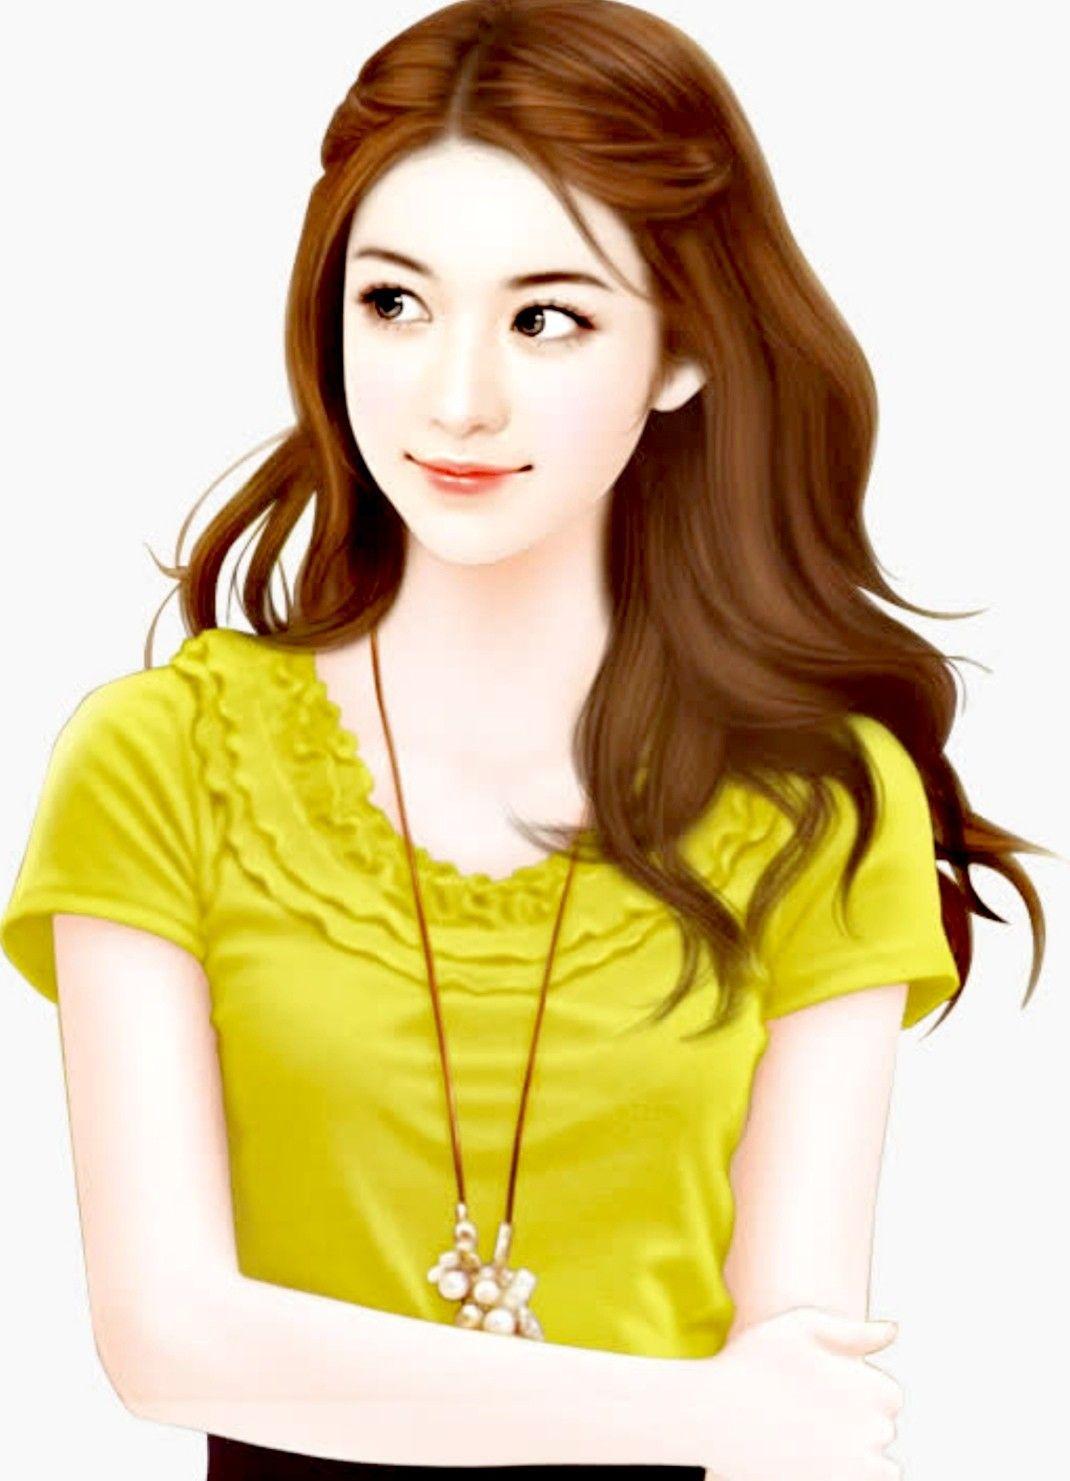 Pin oleh Tu Siripreeya di 美图 Anime gadis cantik, Lukisan